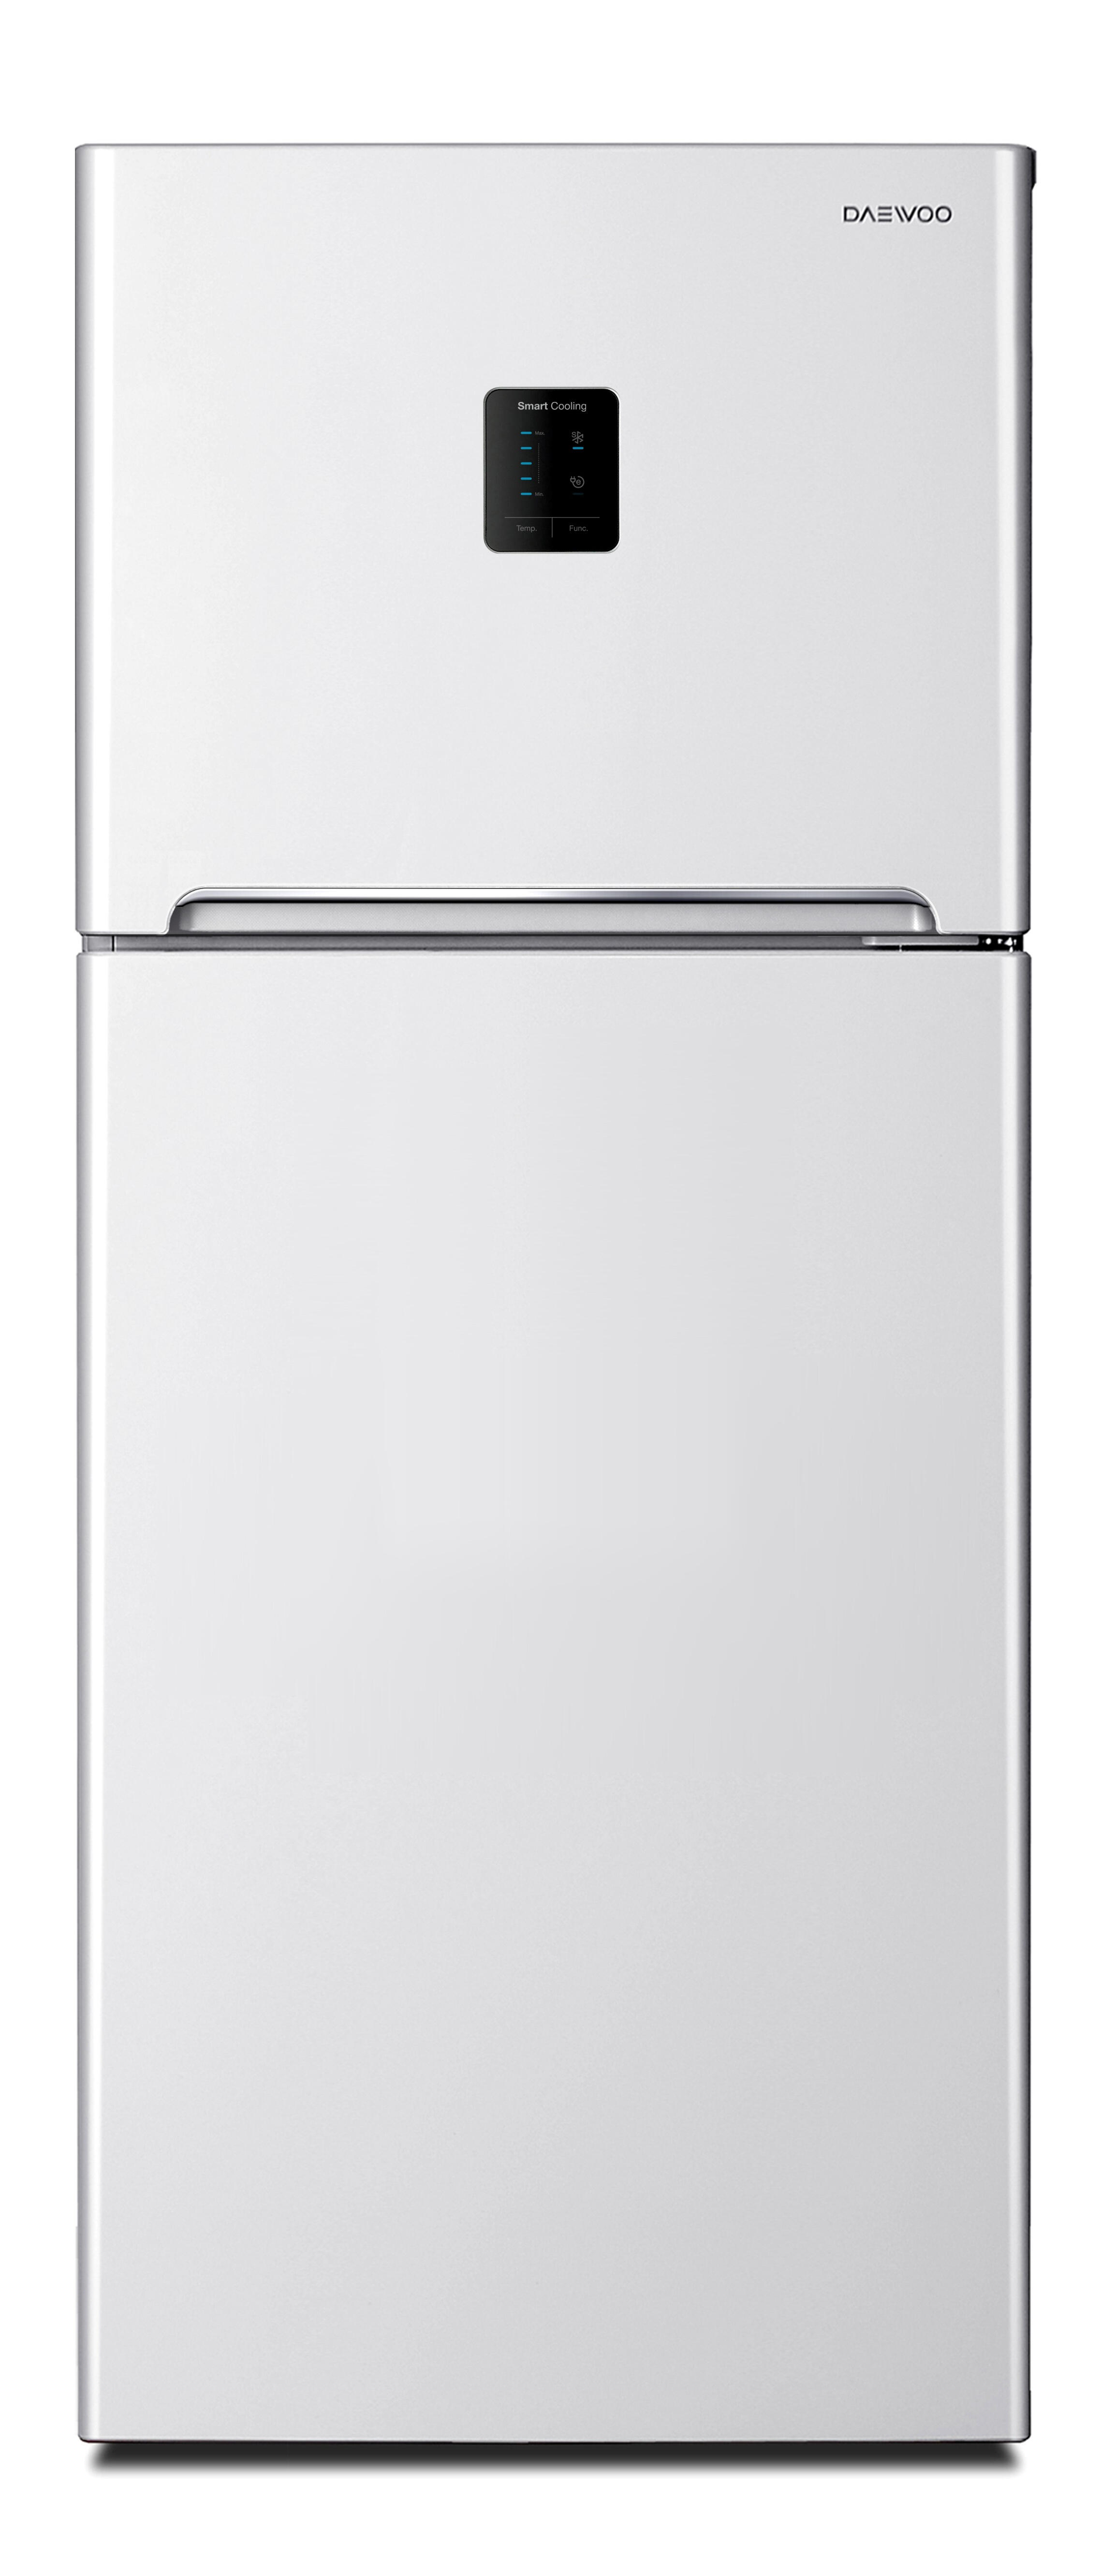 2 Estantes Compacto Blanco Nevera Frigorífico Mini frigo Puerta de cristal A